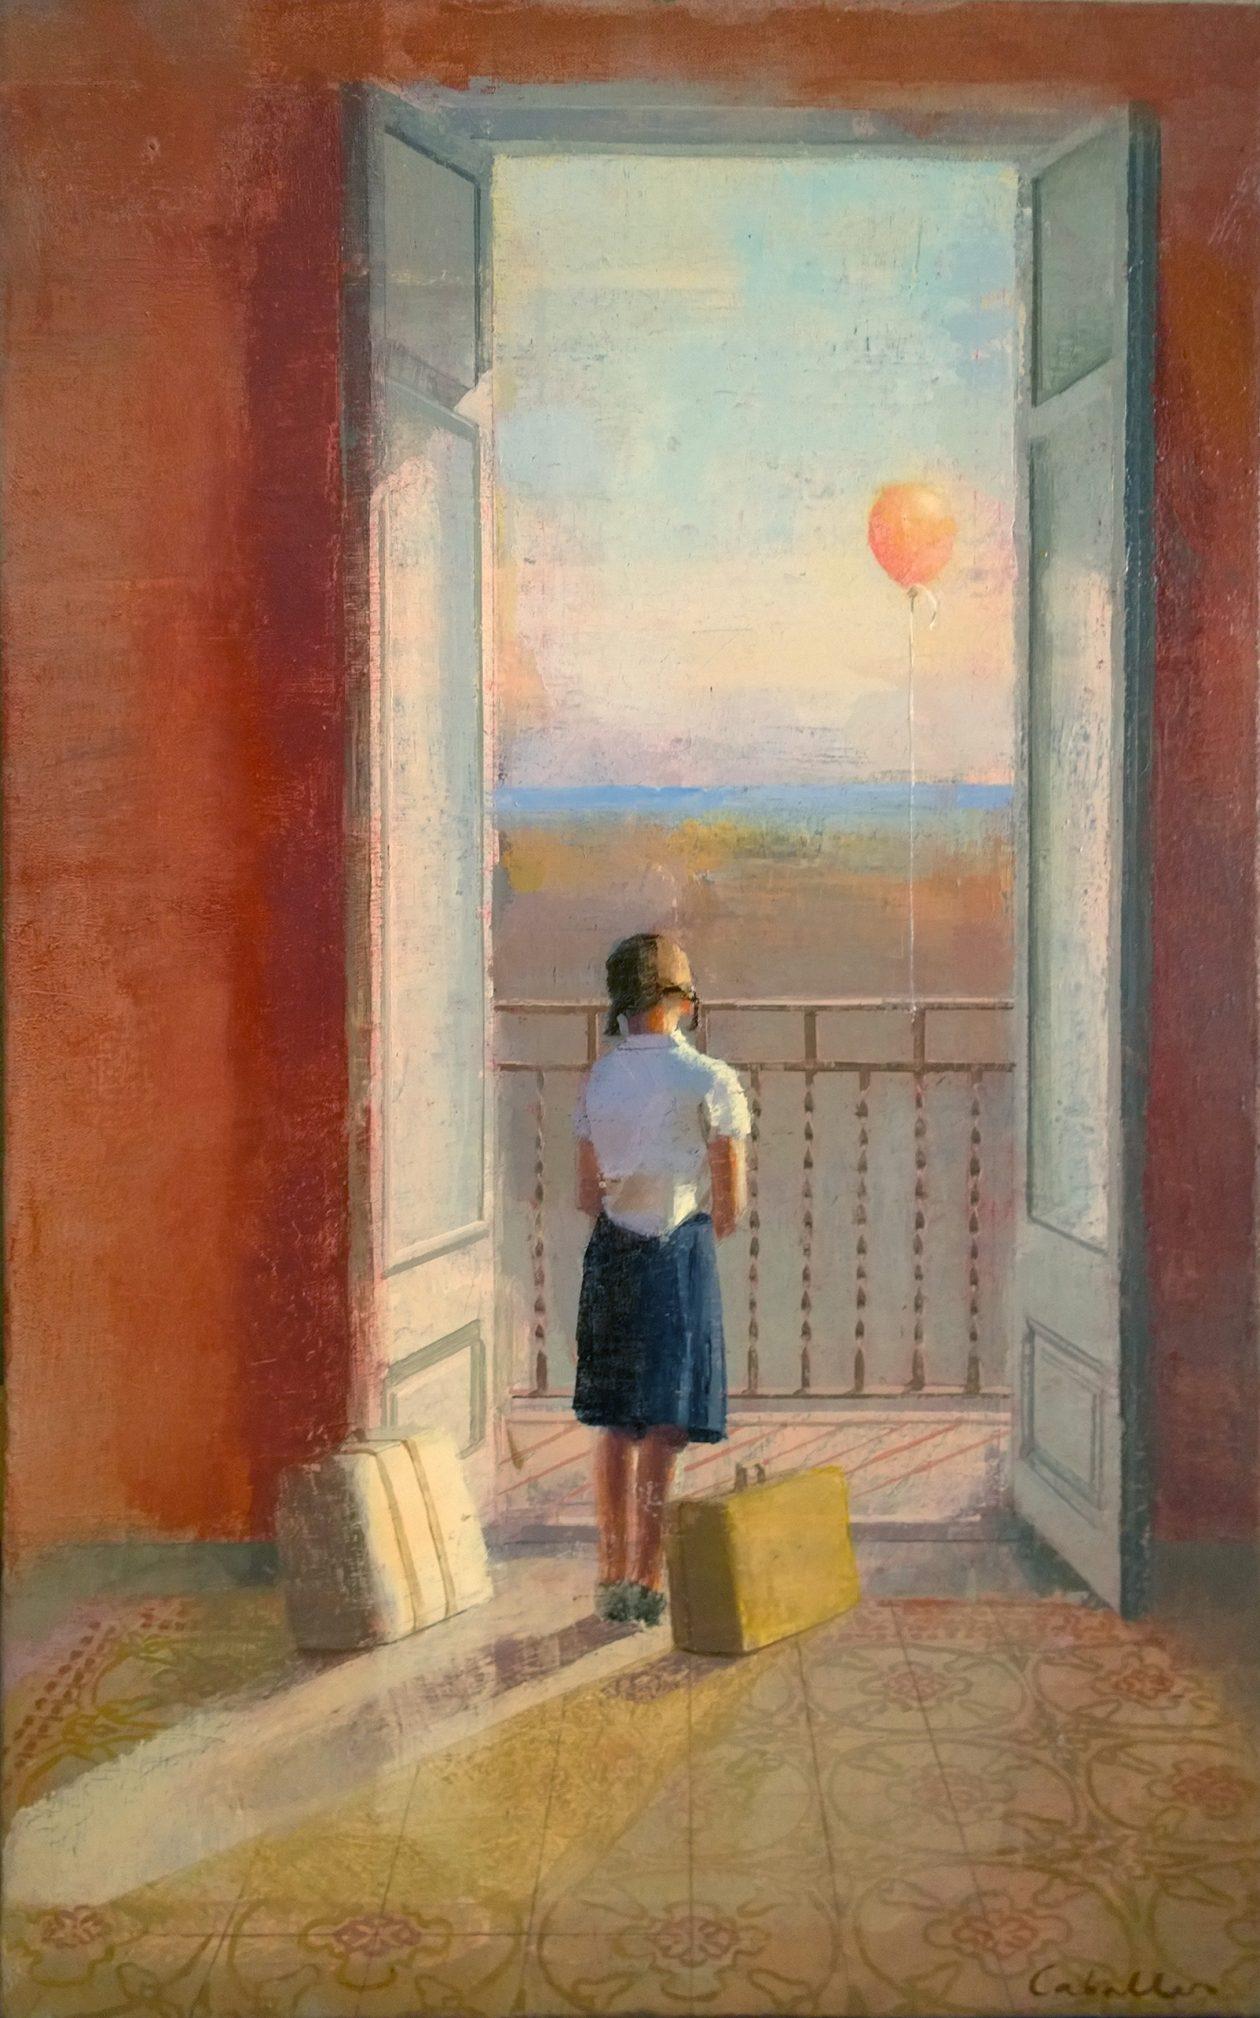 mudanza-alejandra-caballero-oleo-interior-balcon-abierto-niña-maletas-globo-playa-mar